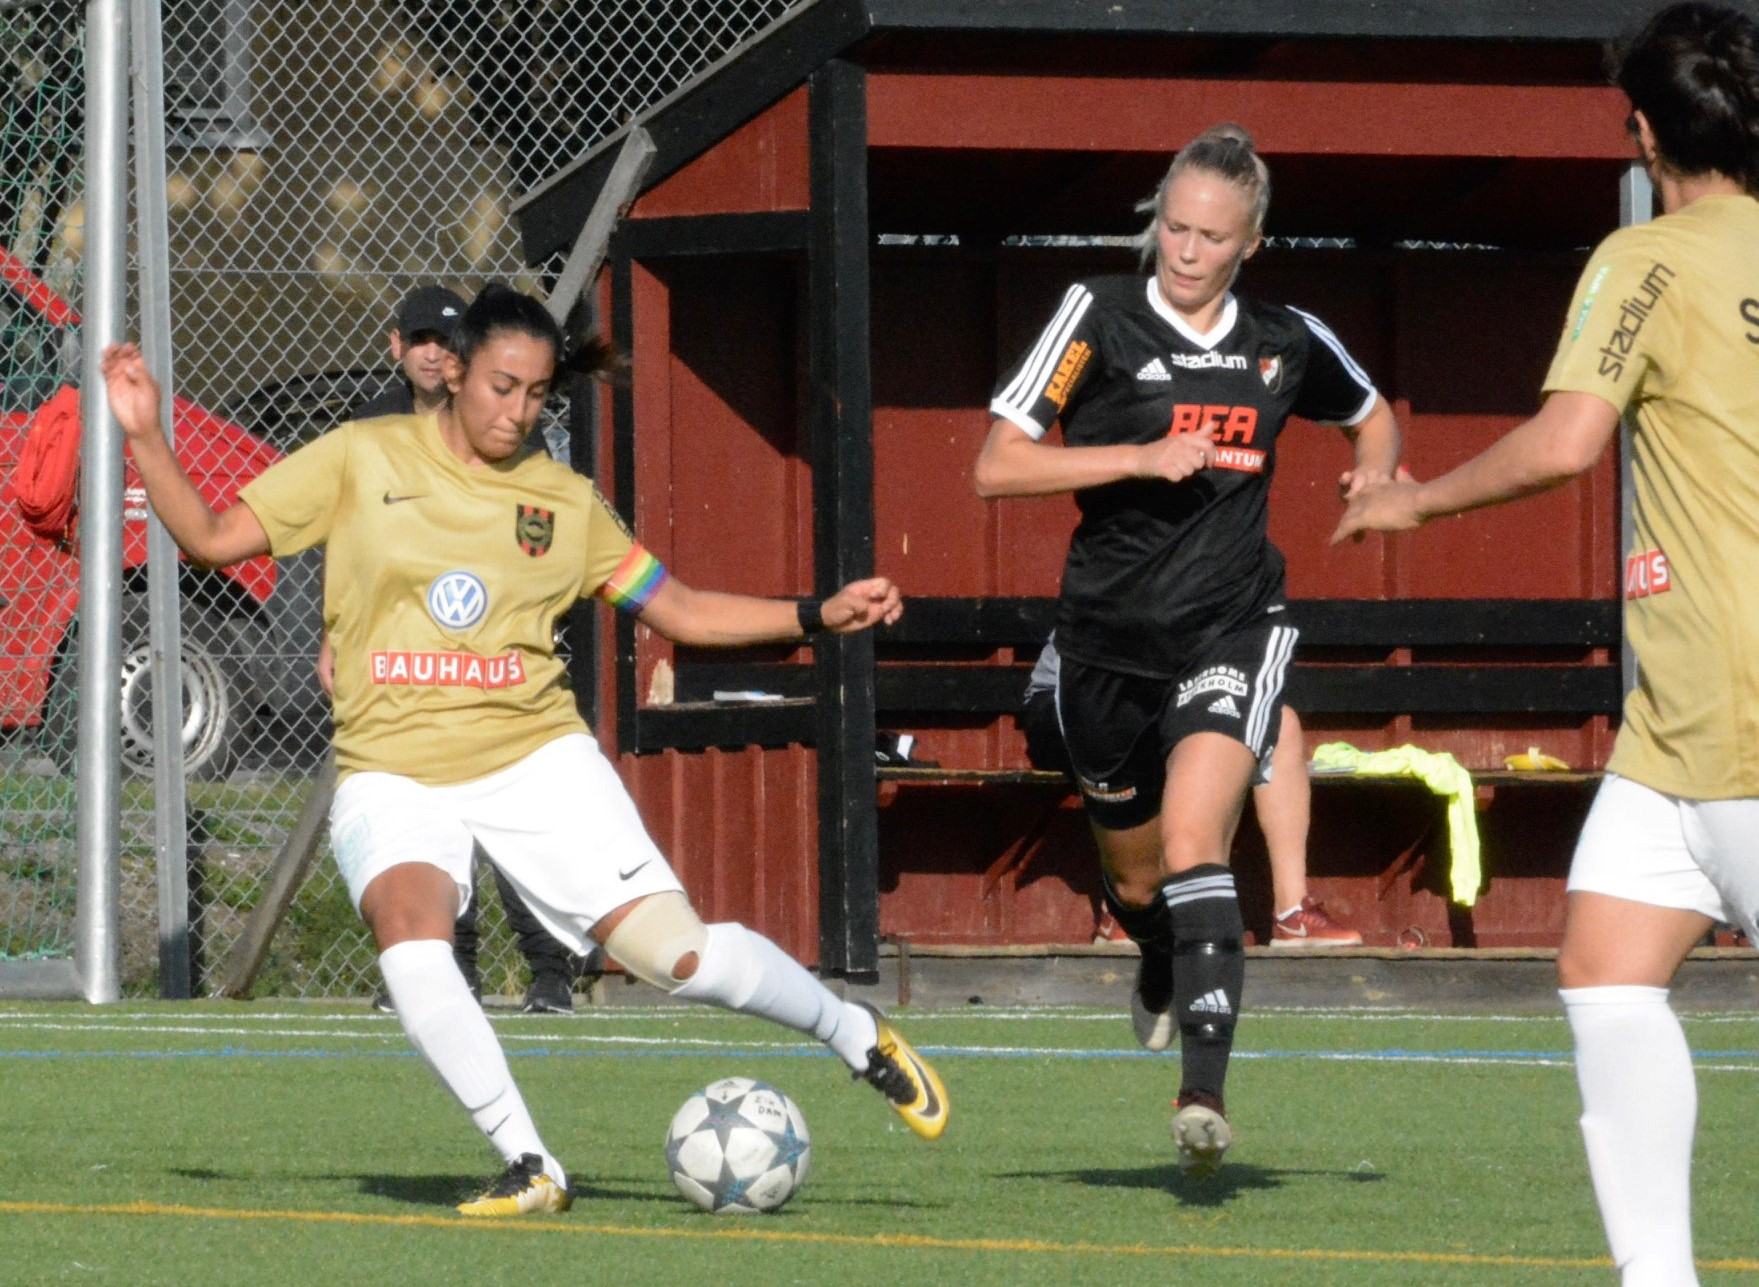 Inför BP – AIK: Kvartsfinal i Victoria Cup